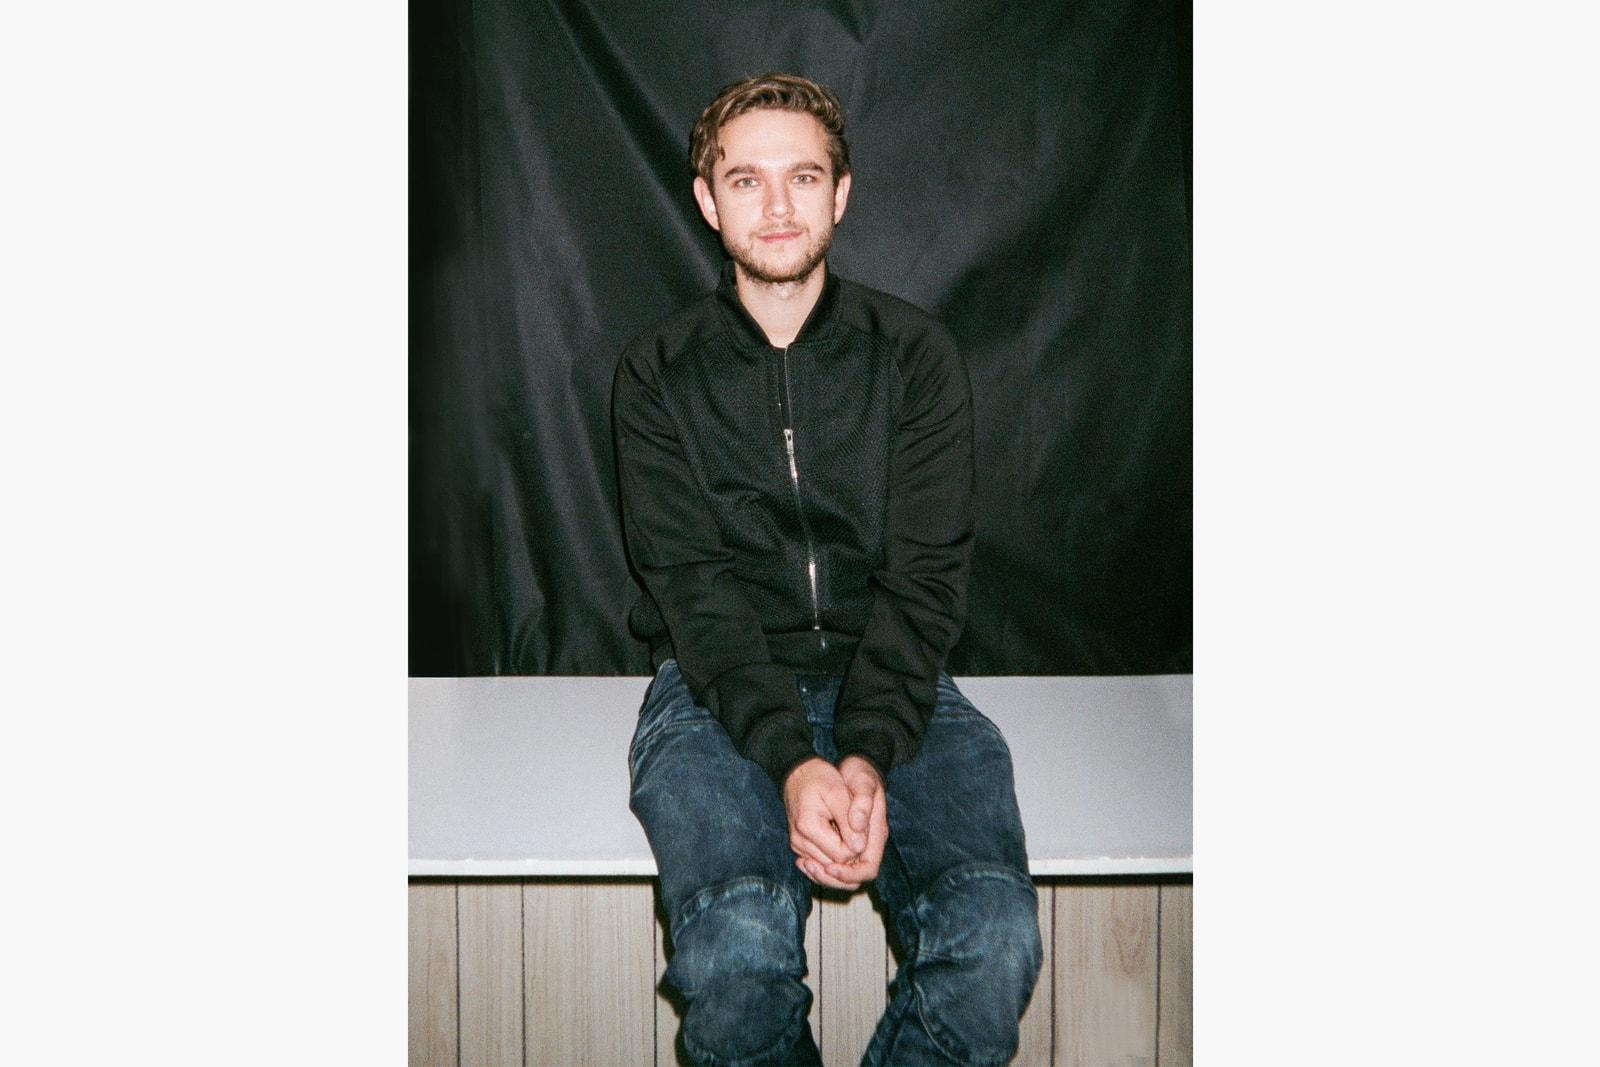 Zedd Ghostproducing, His SoundCloud Career & Working with Skrillex